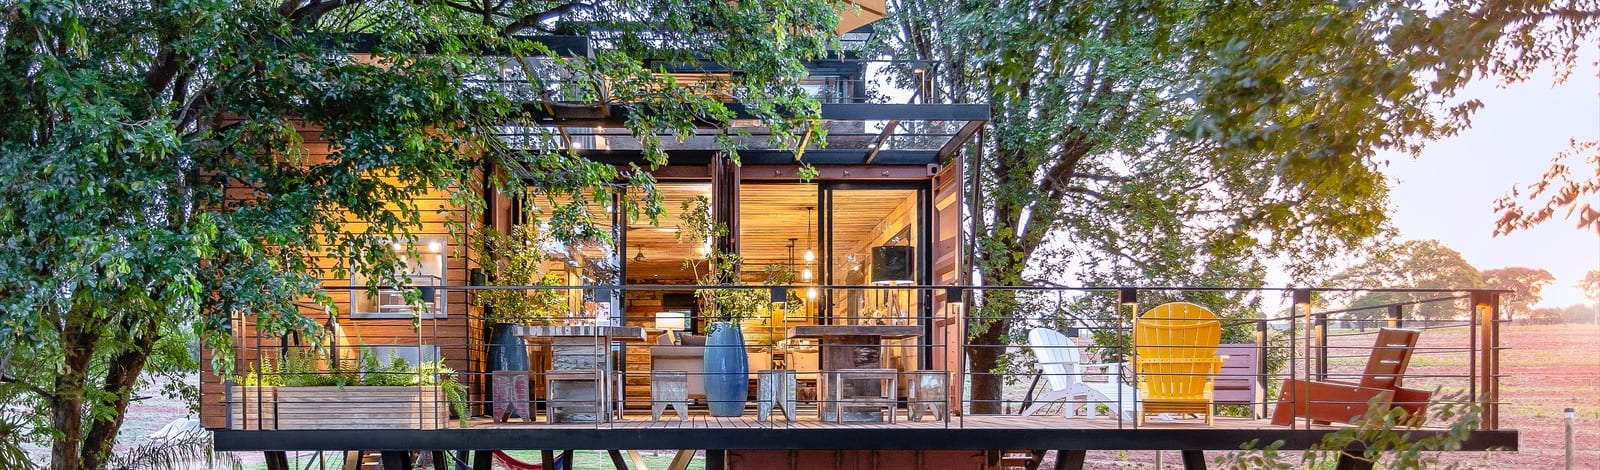 Casa Container Marilia – Barros Assuane Arquitetura